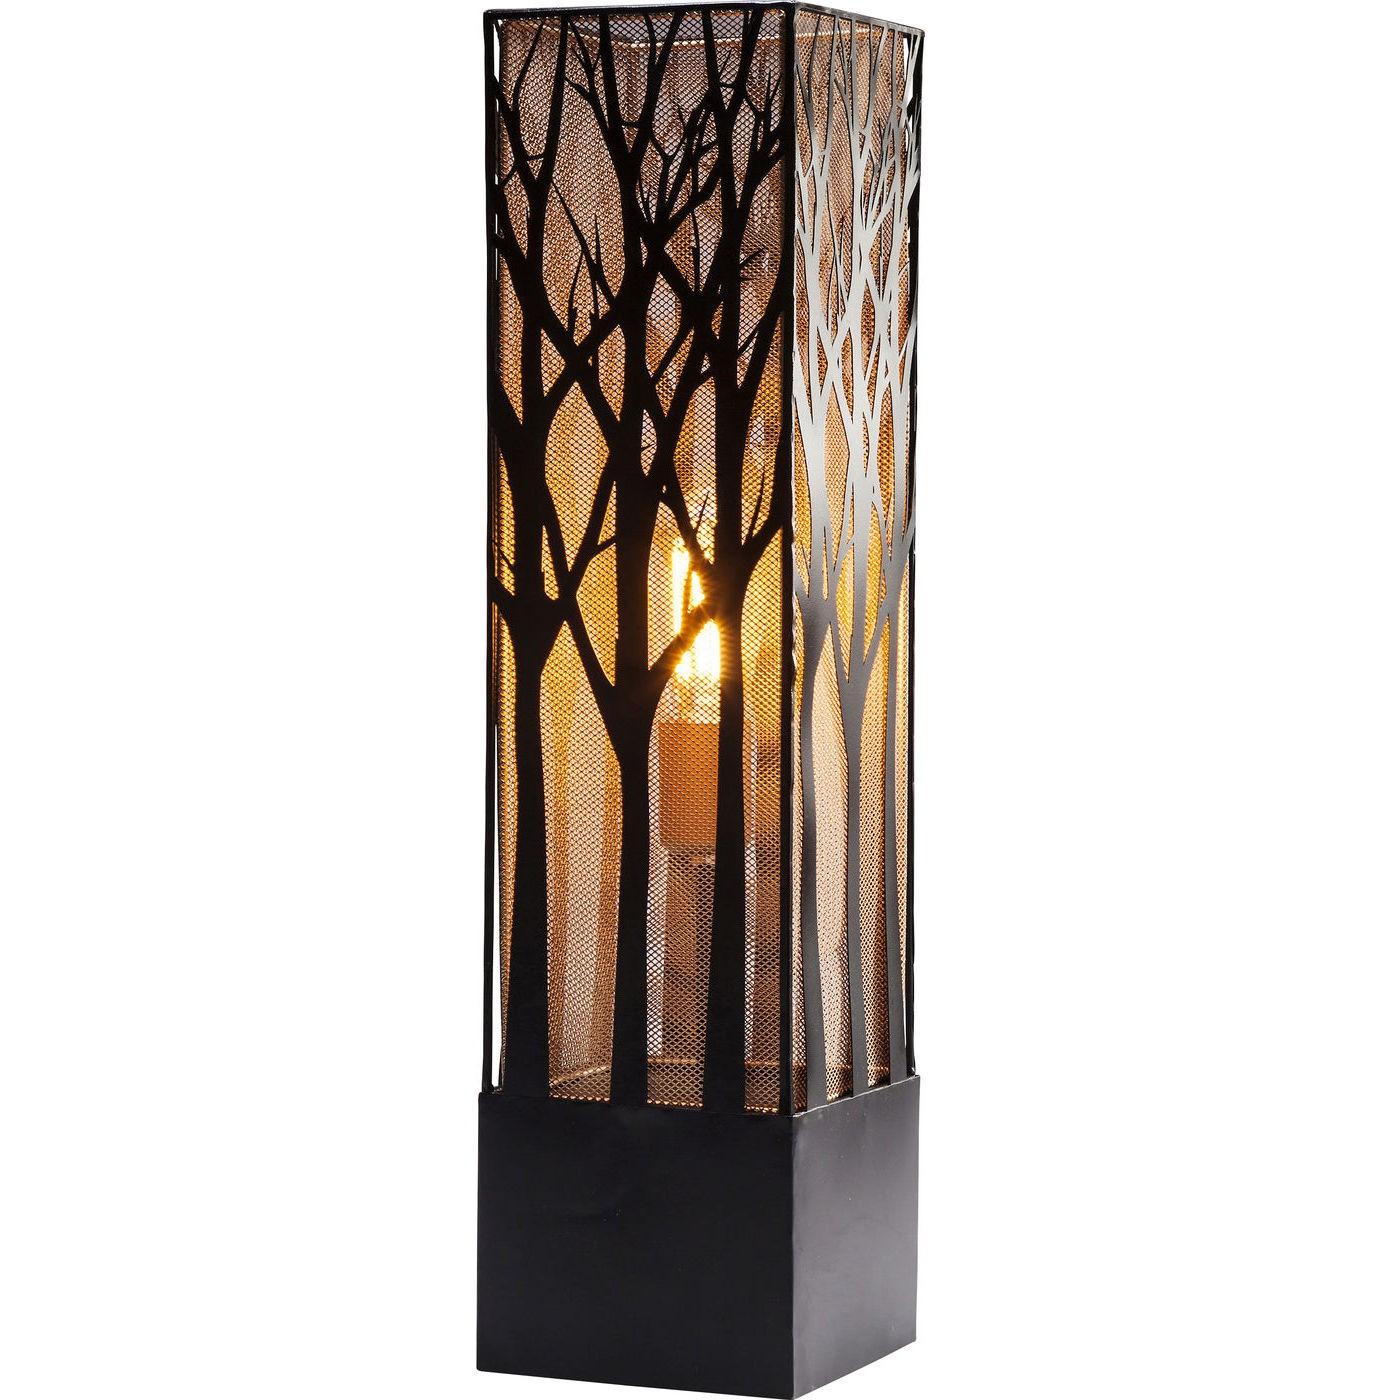 Image of   Gulvlampe Mystery Tree 79 cm